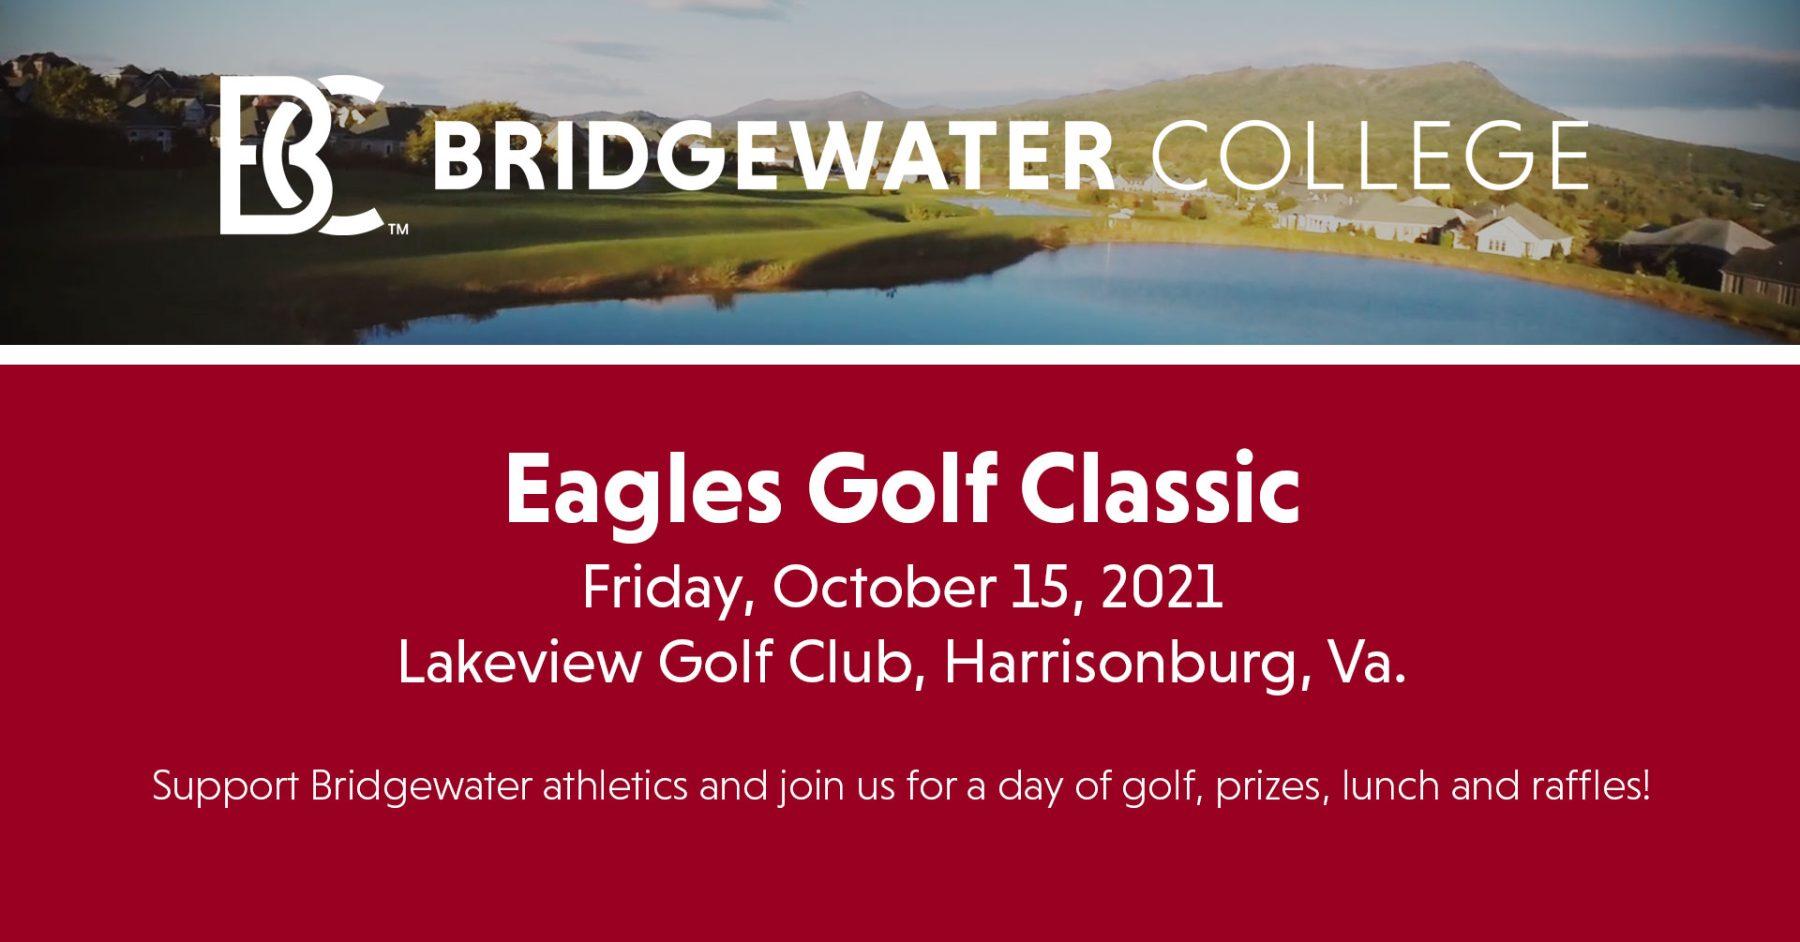 Eagles Golf Classic